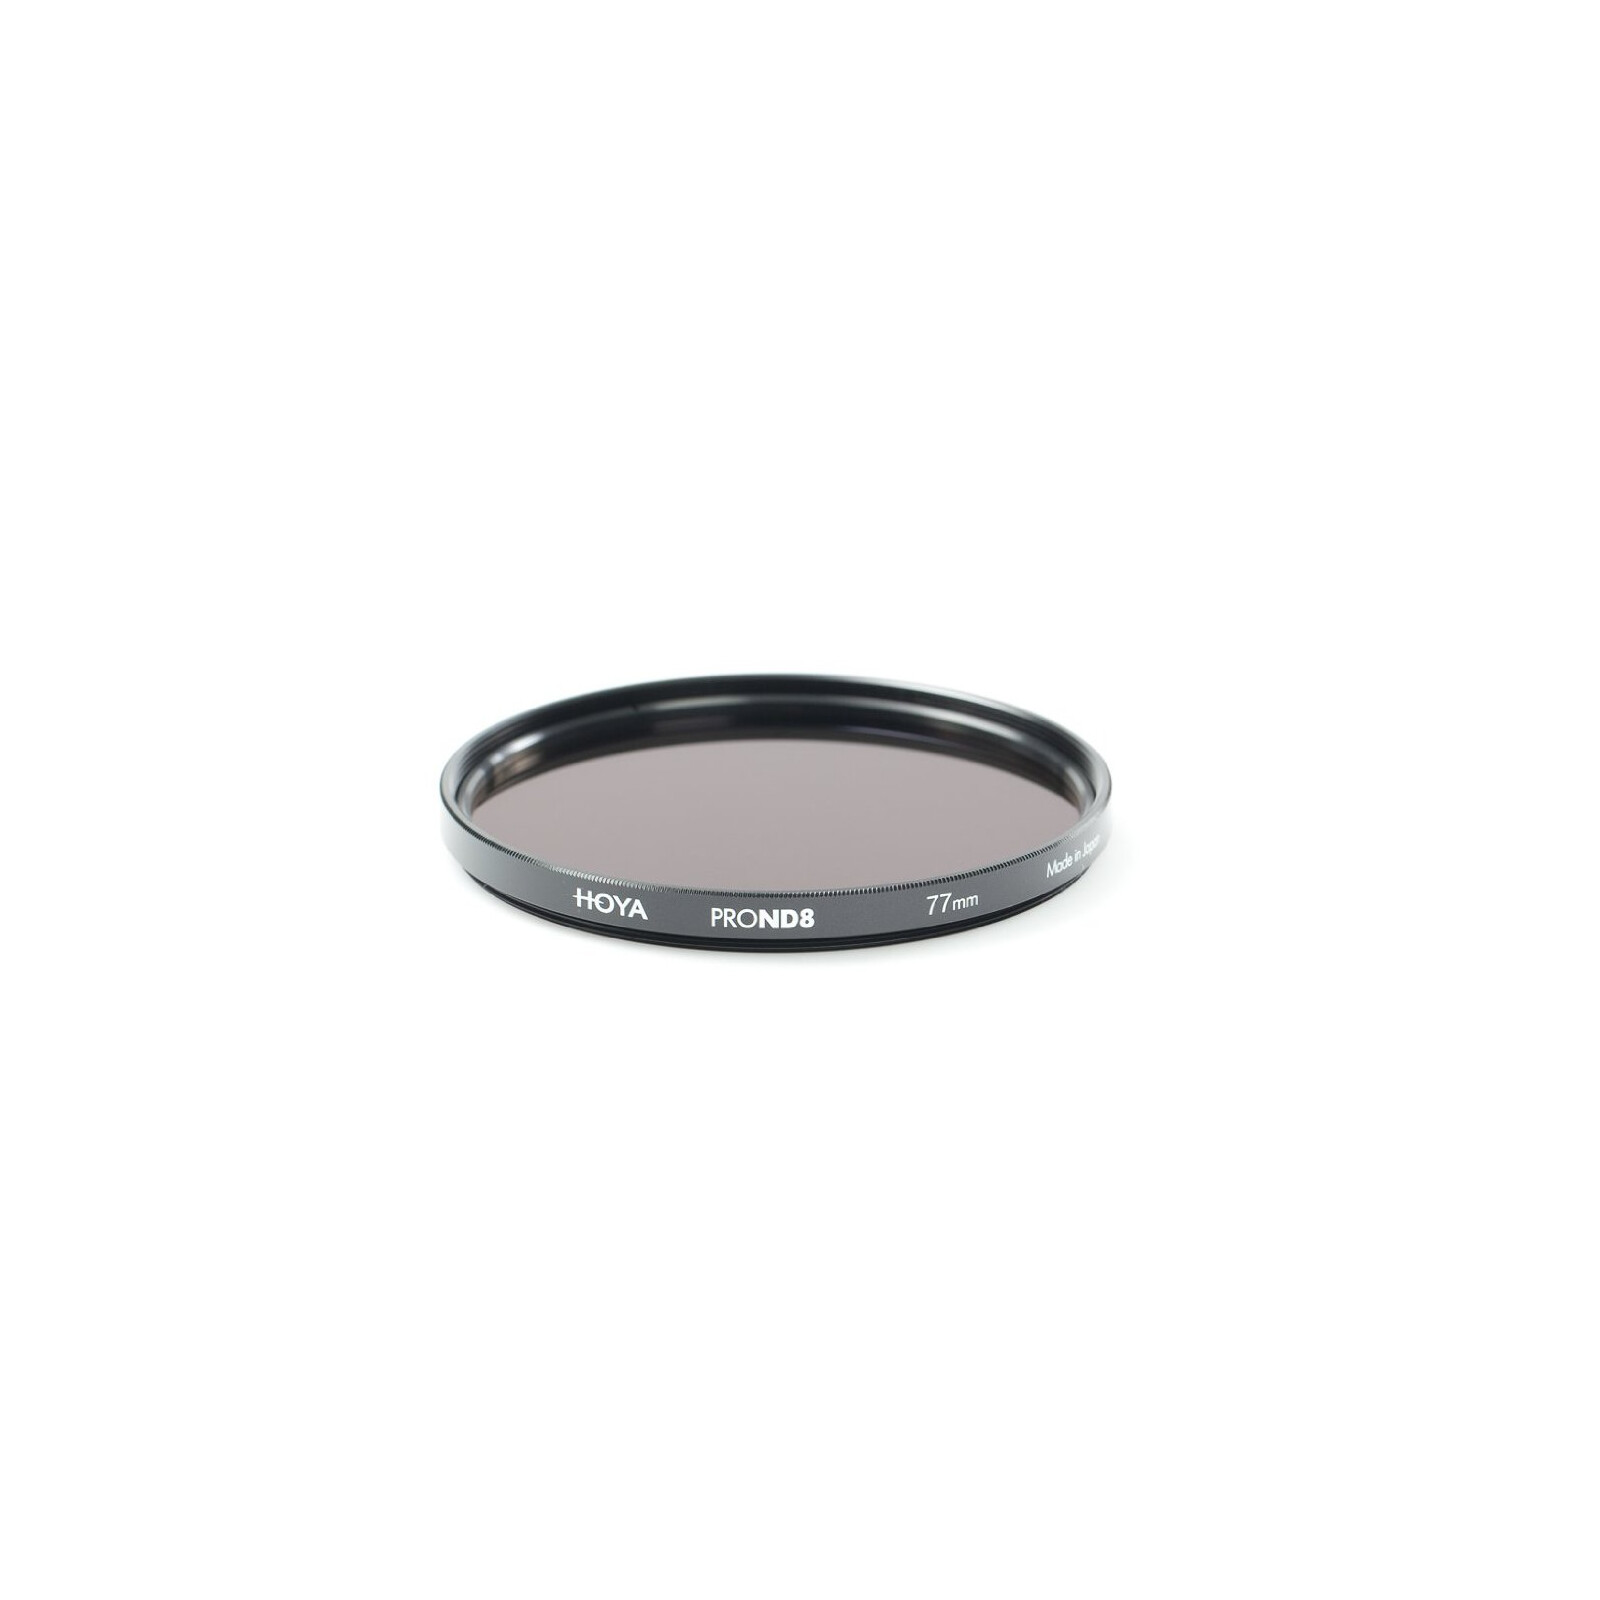 Hoya Grau PRO ND 8 77mm